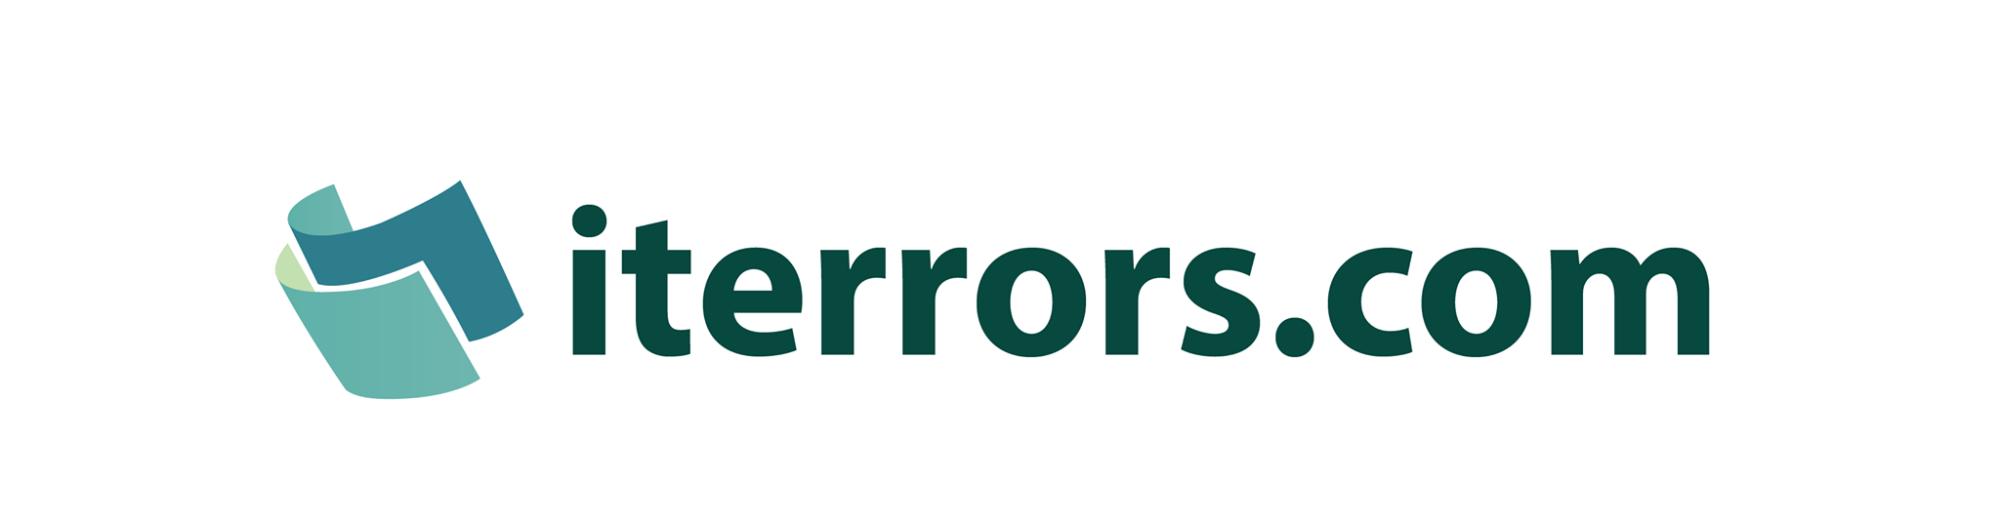 ITerrors.com